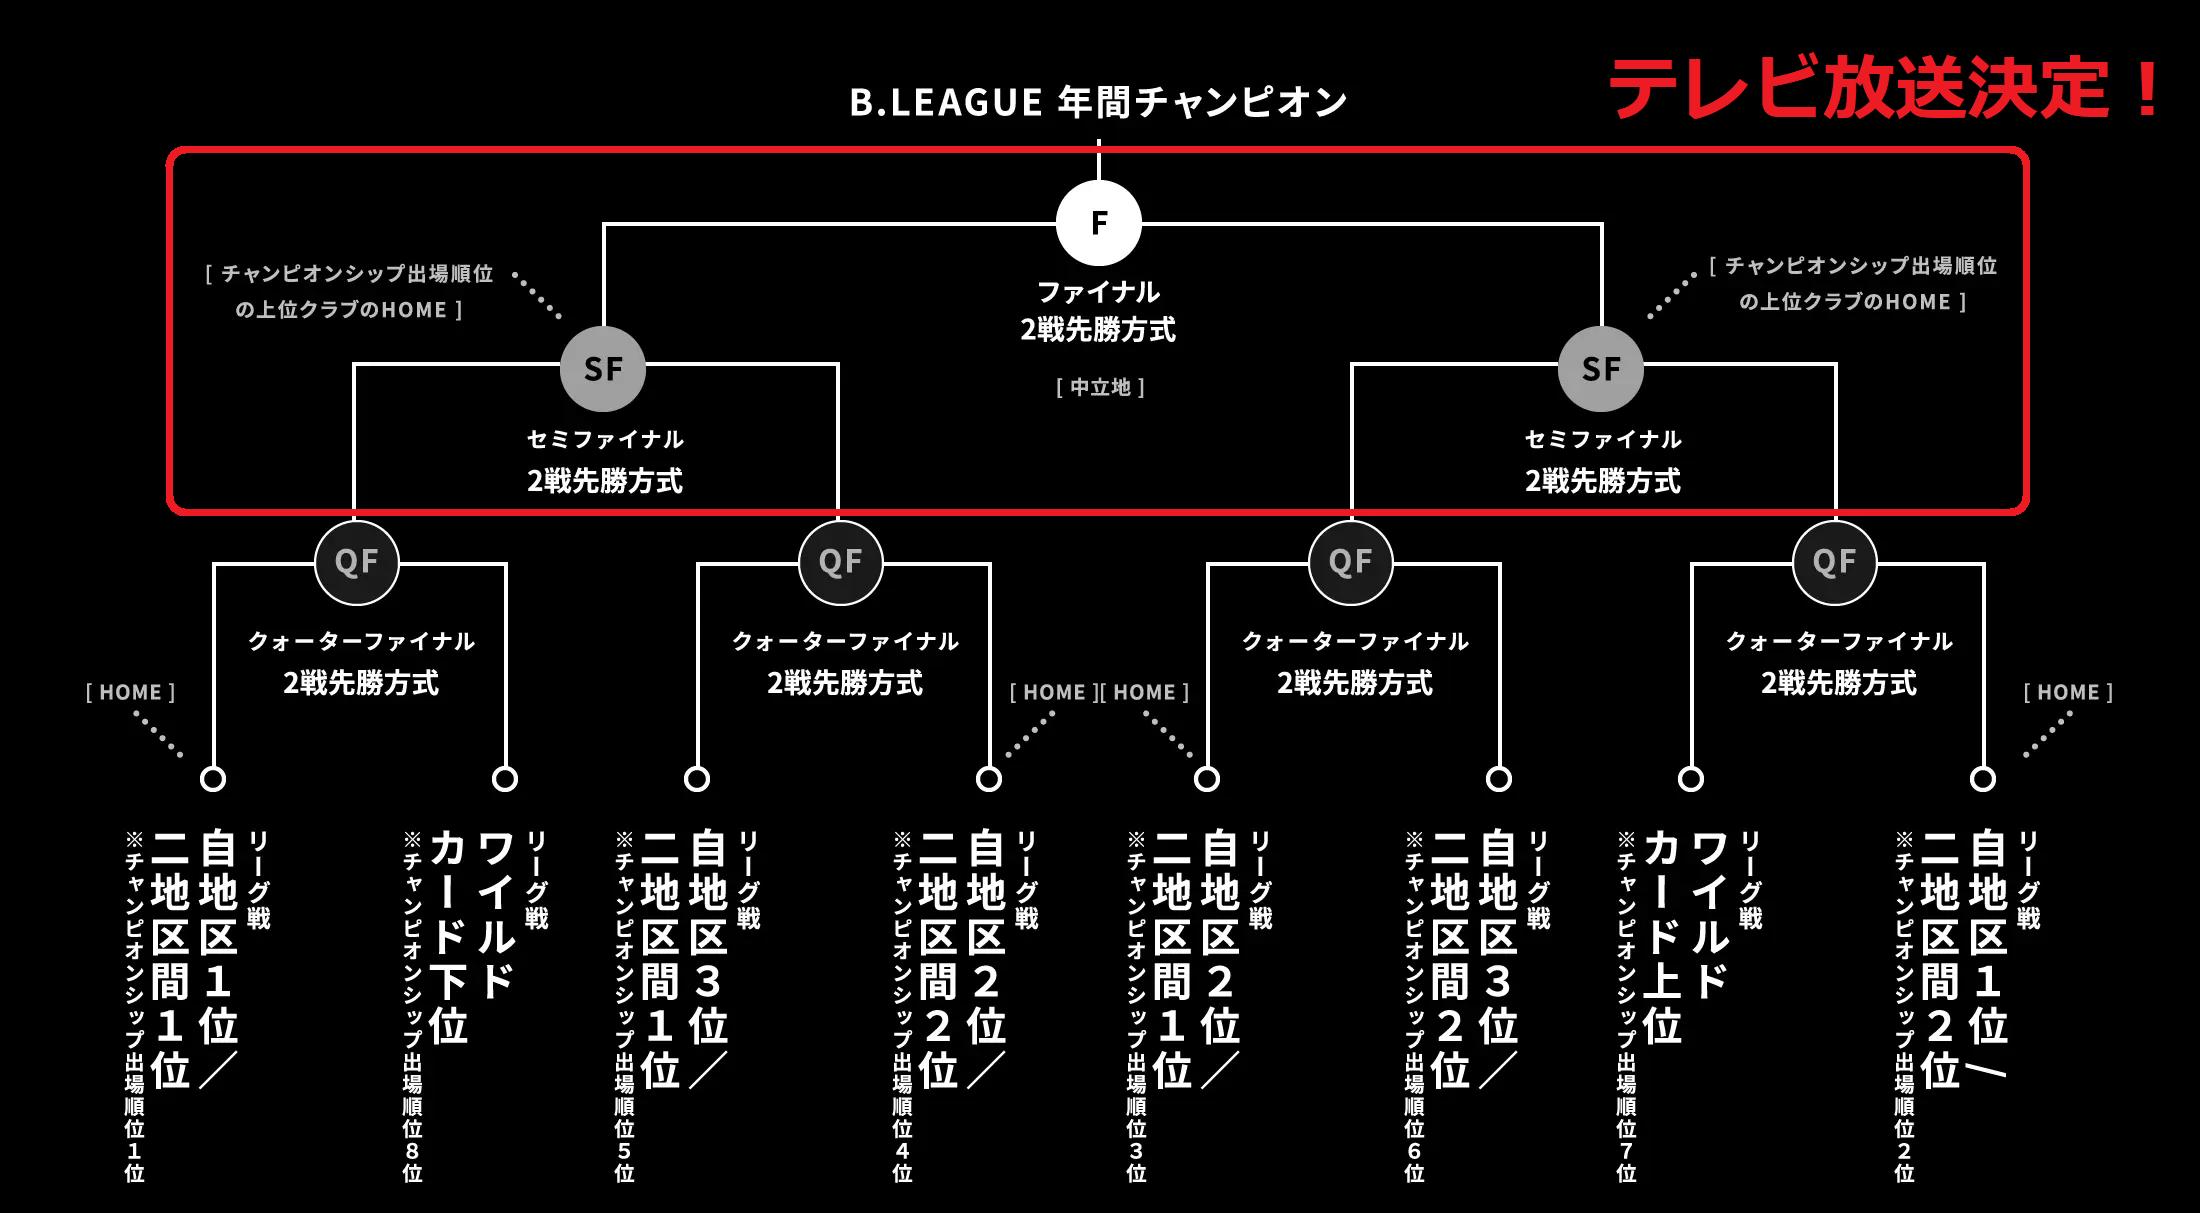 Bリーグ2020-21_チャンピオンシップ_トーナメント表3